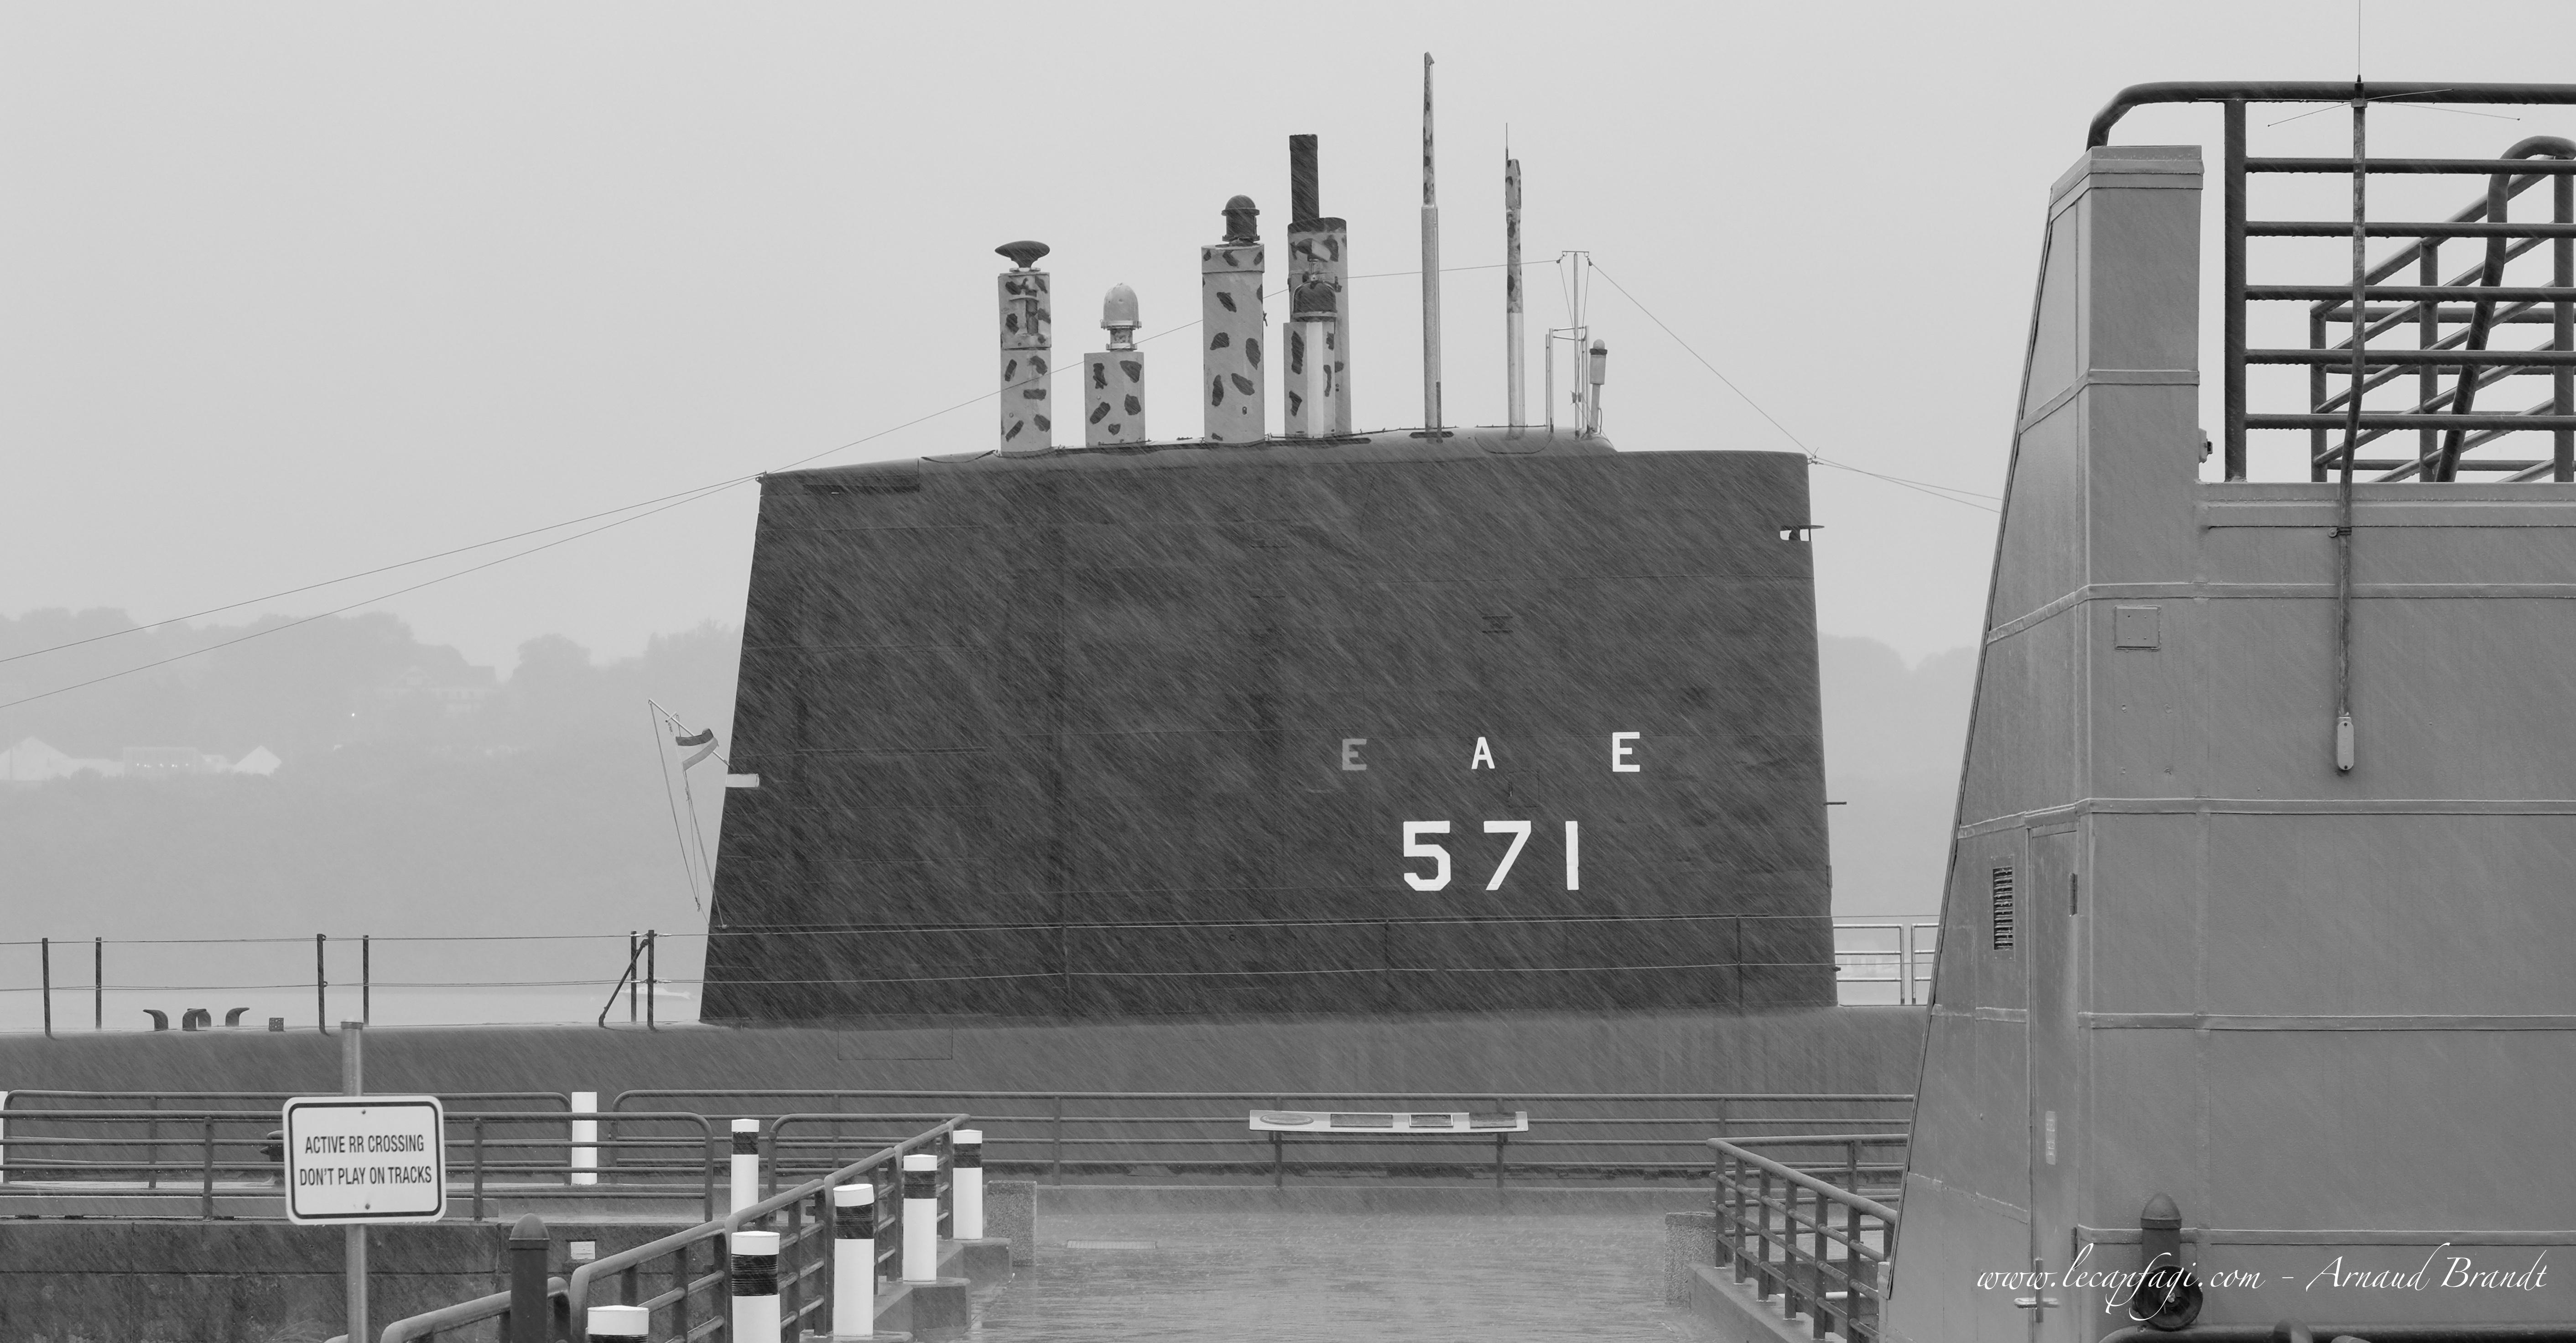 USS Nautilus (first atomic sub)